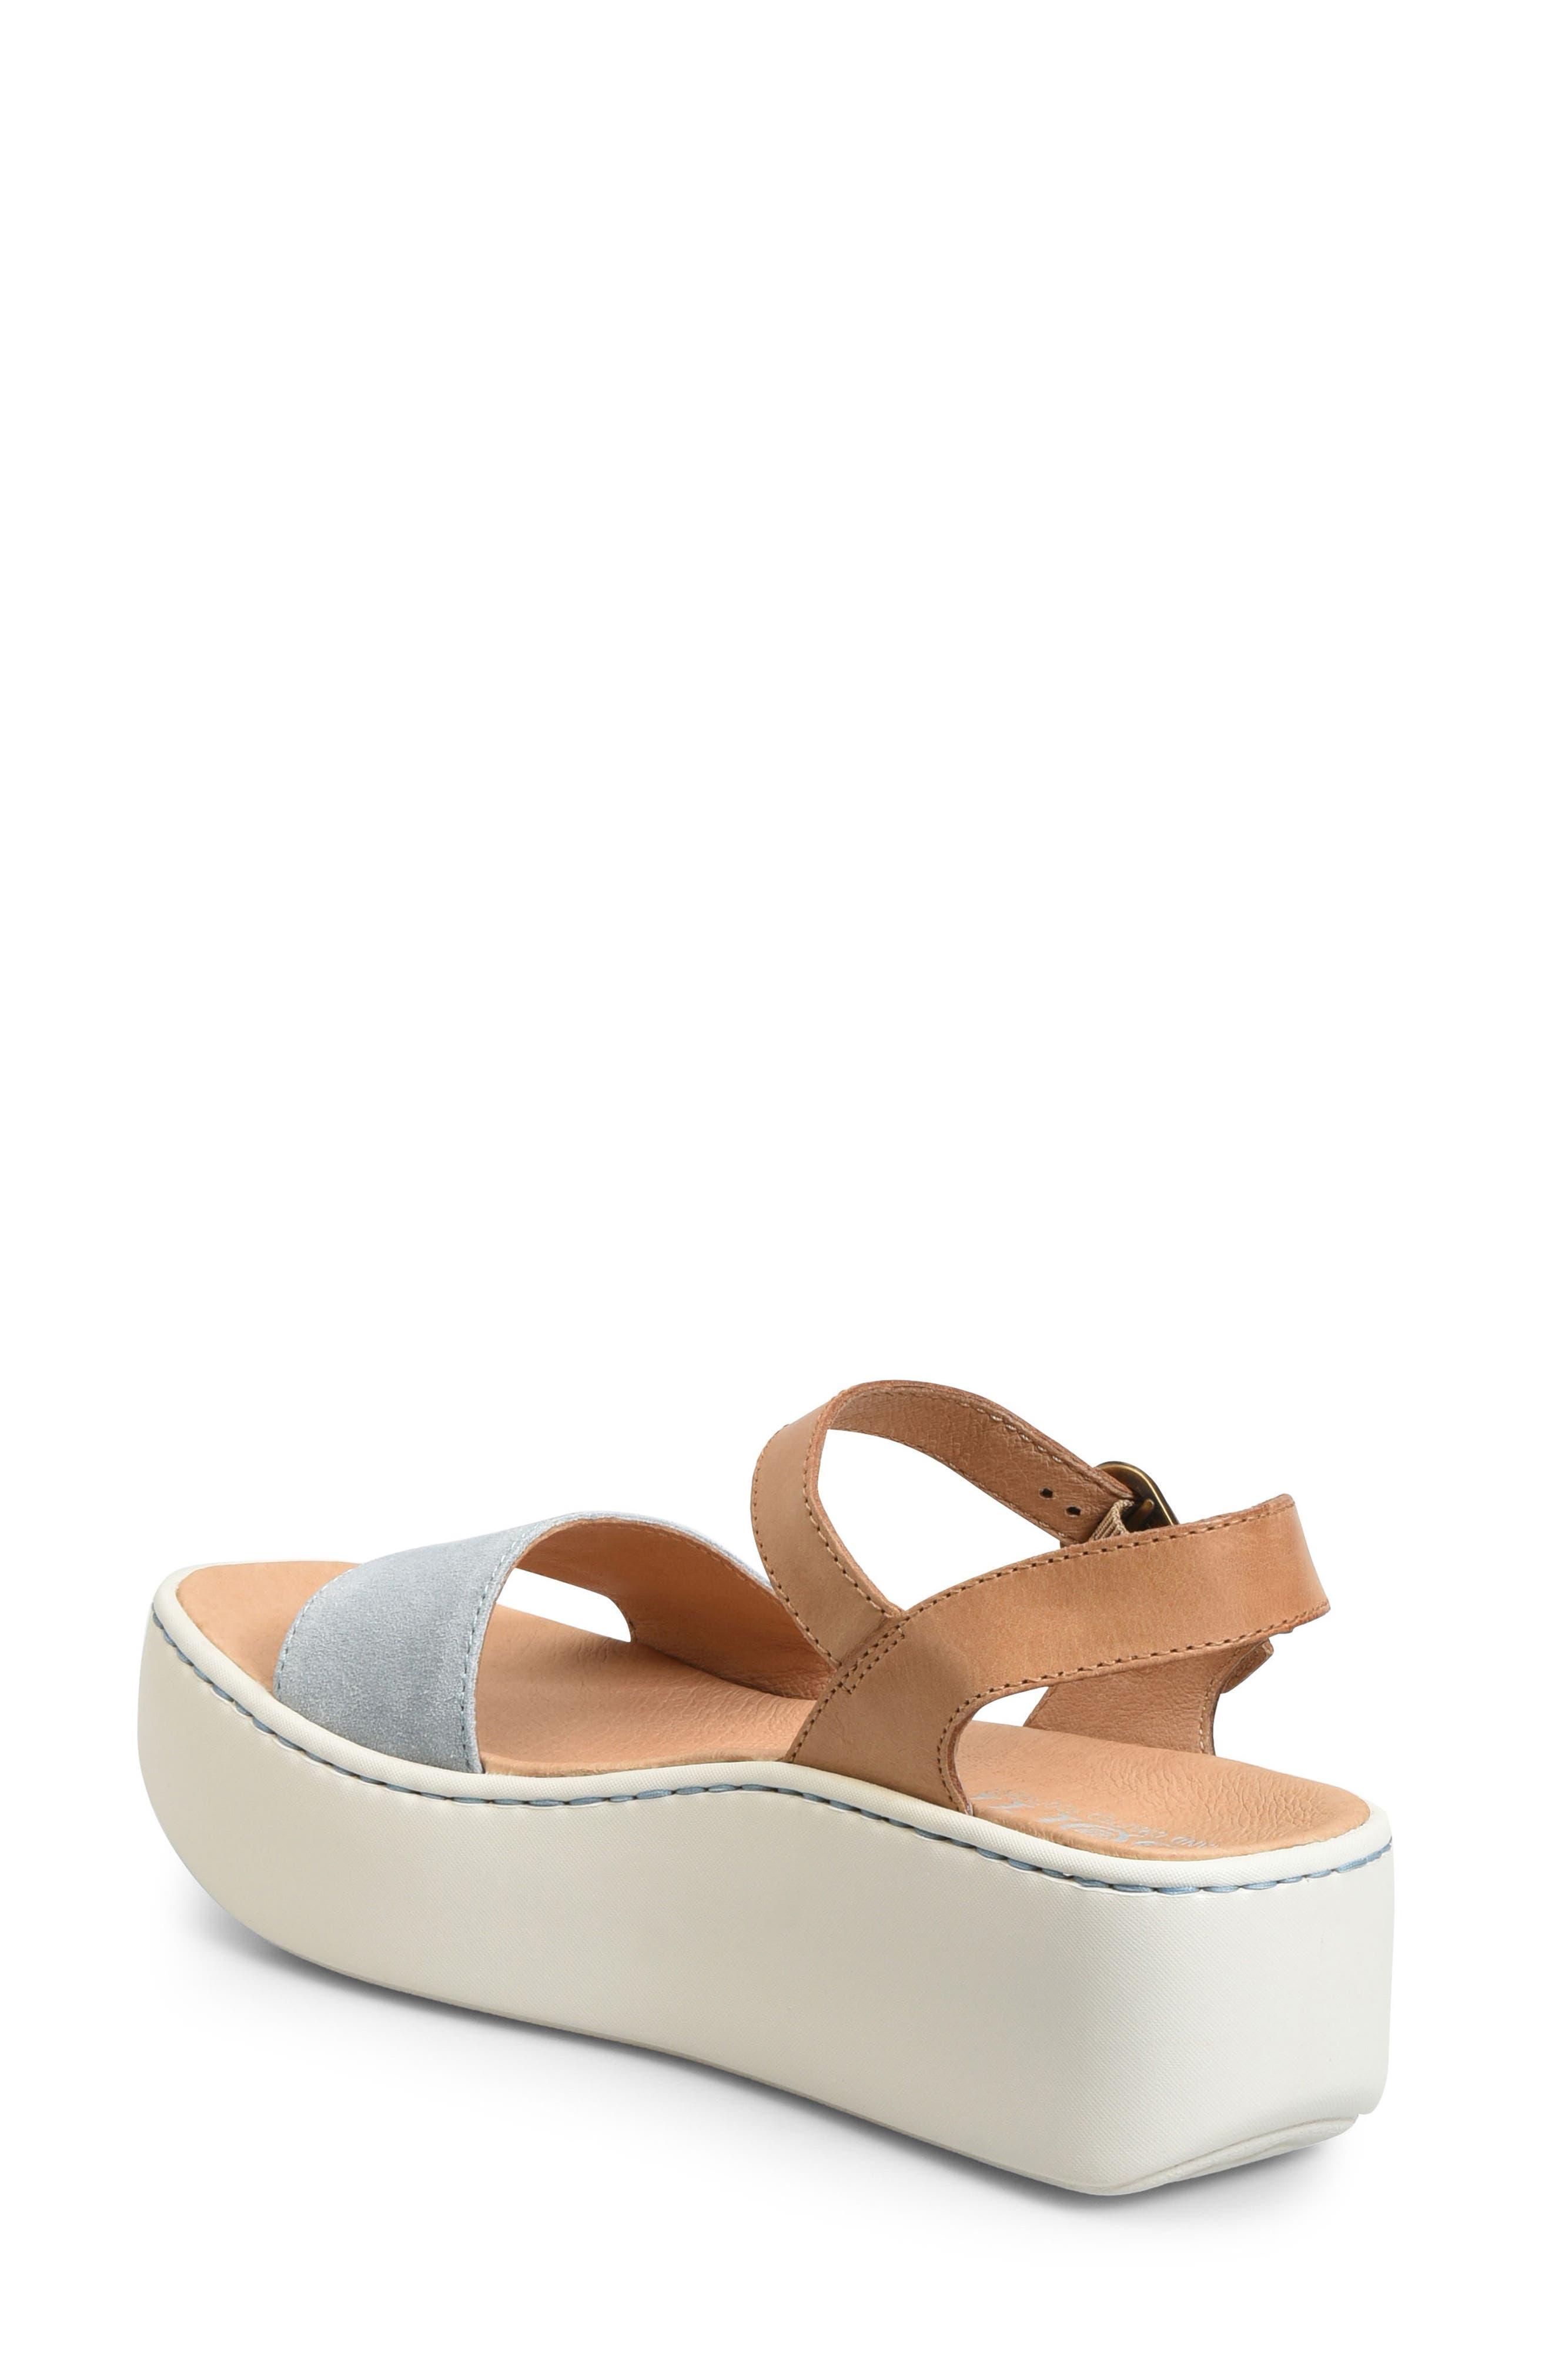 Breaker Platform Sandal,                             Alternate thumbnail 2, color,                             Light Blue/ Tan Leather